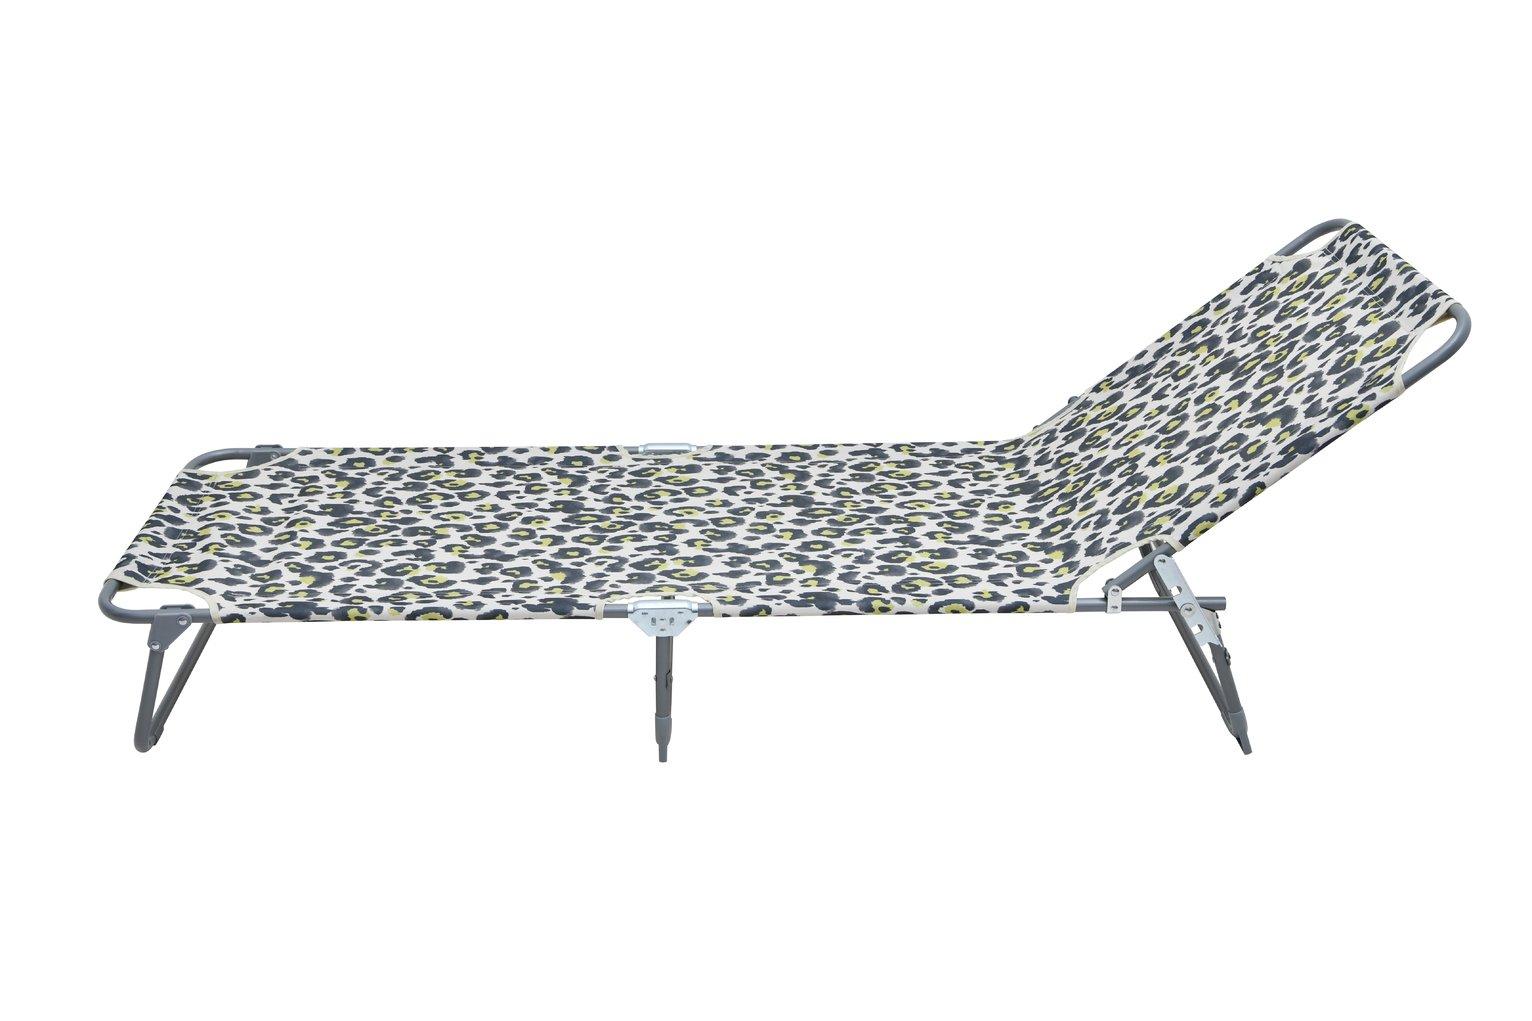 Argos Home Metal Foldable Sun Lounger - Leopard Print